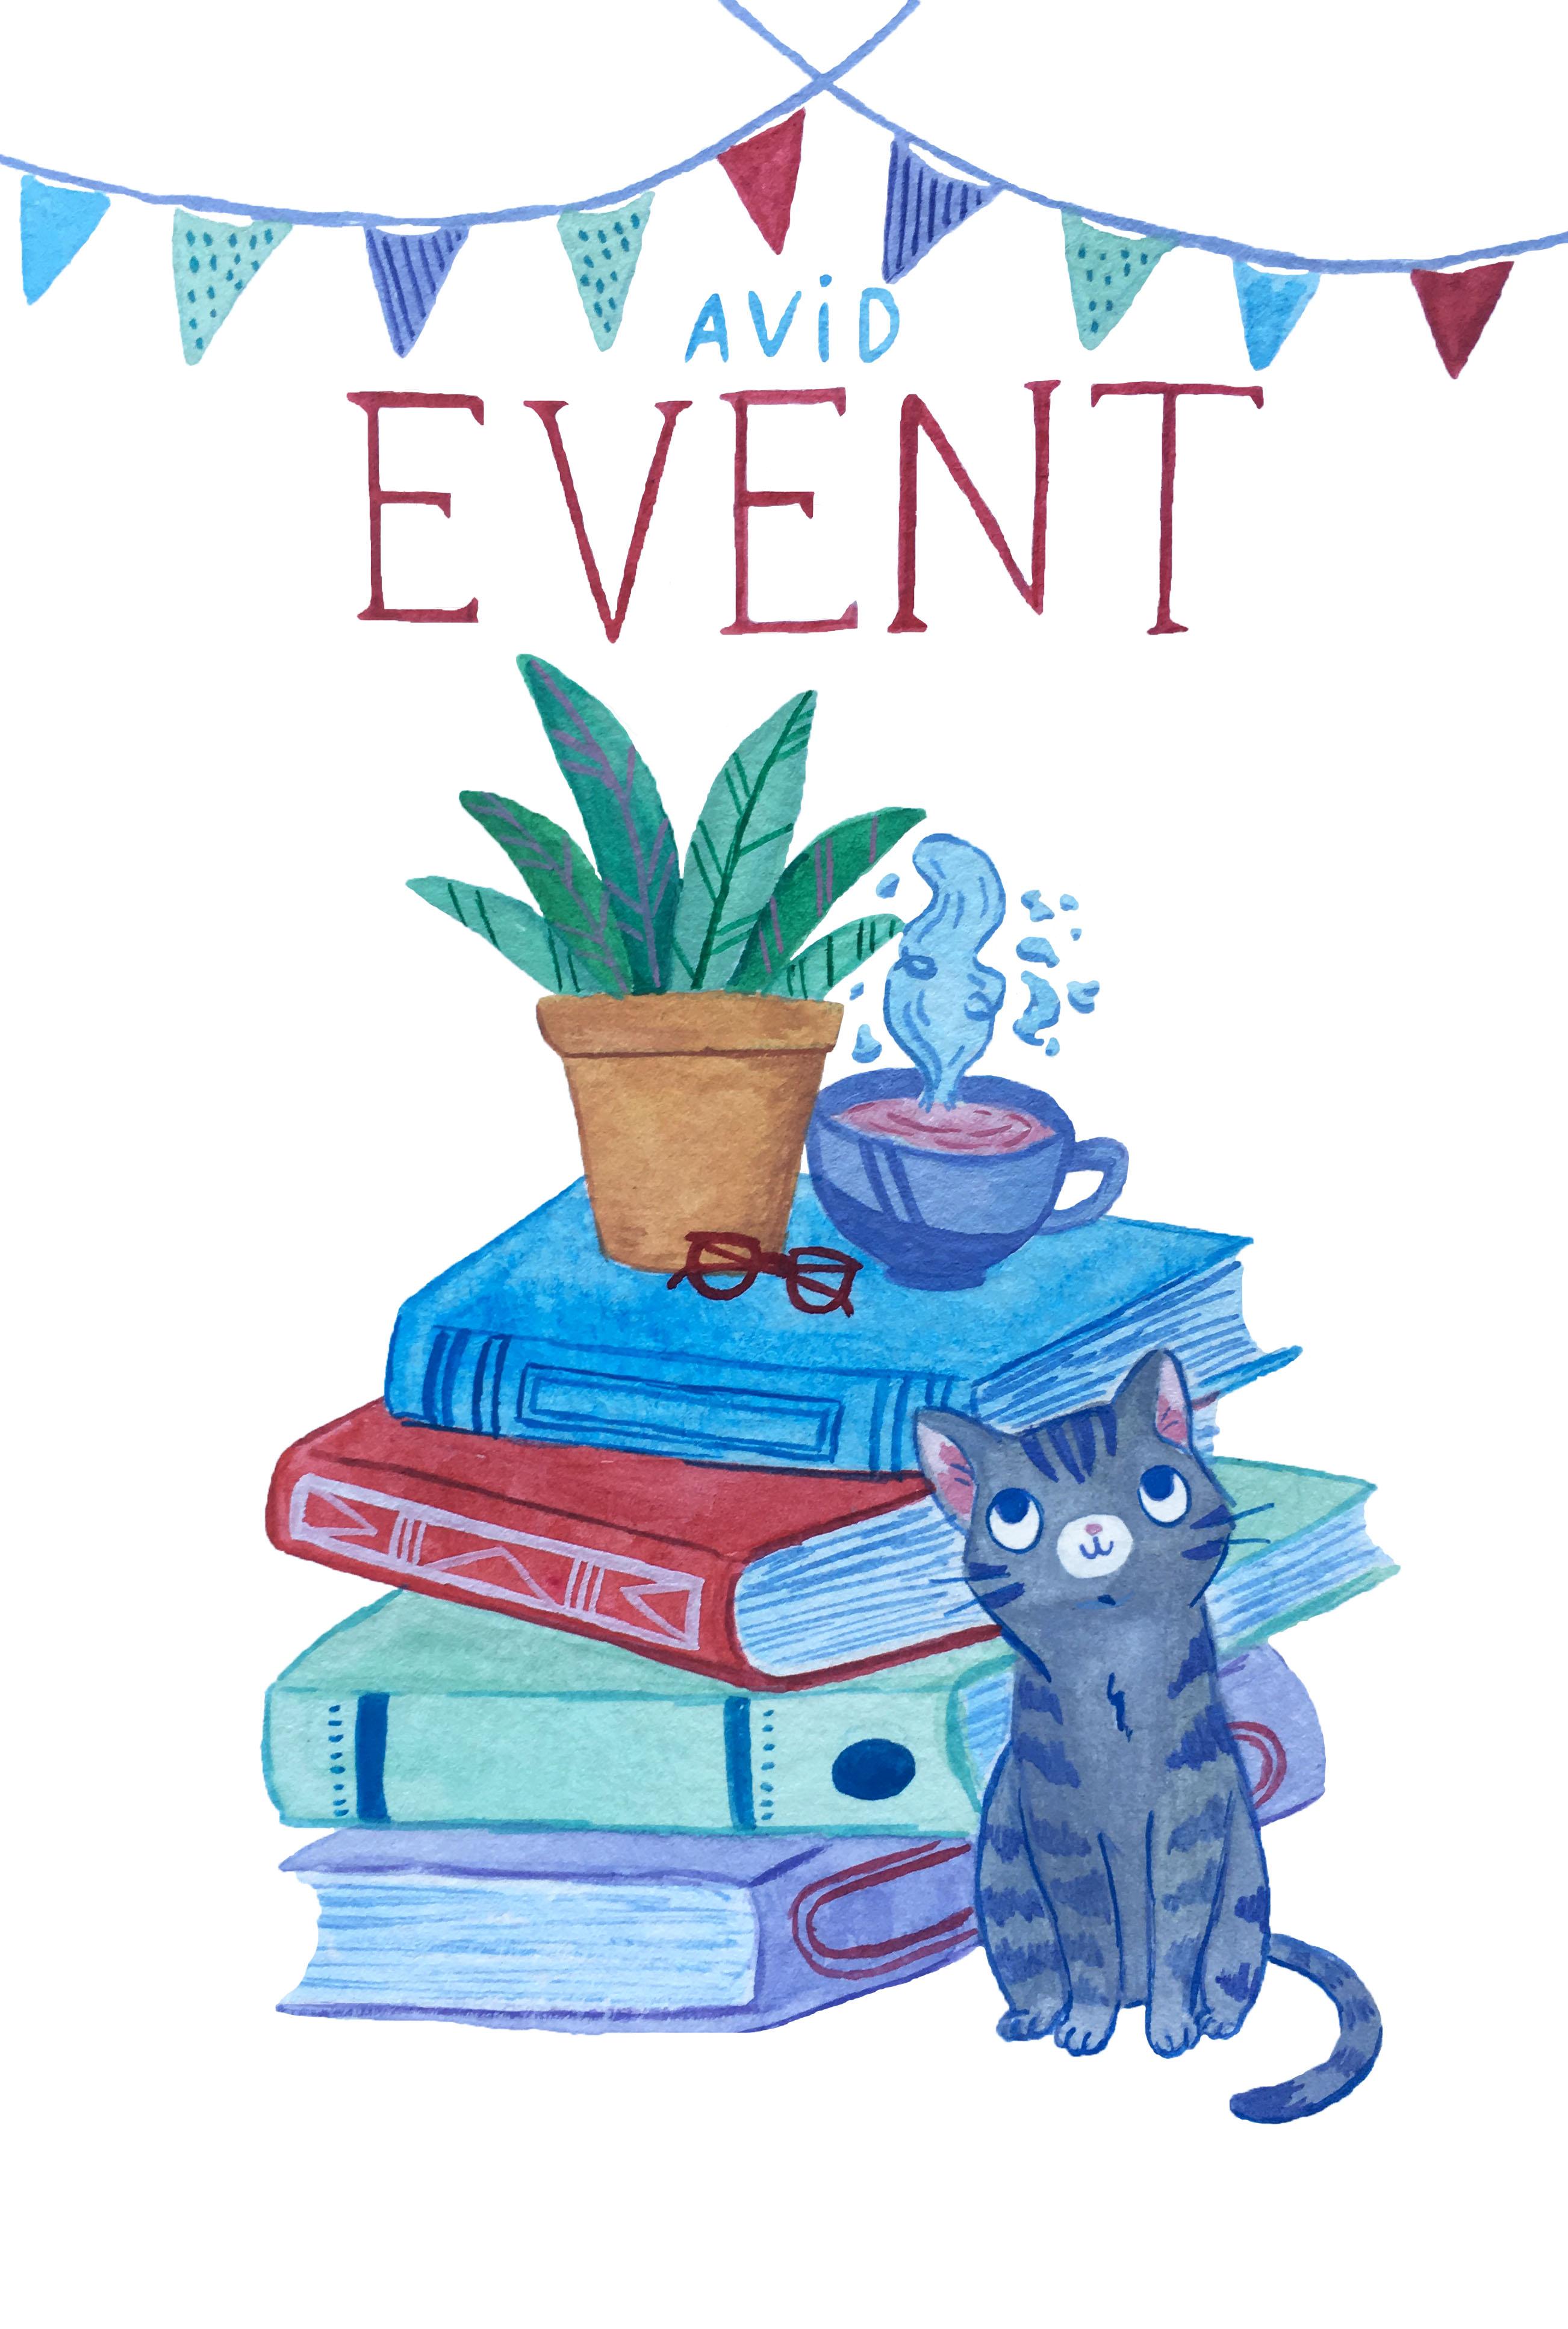 Avid event